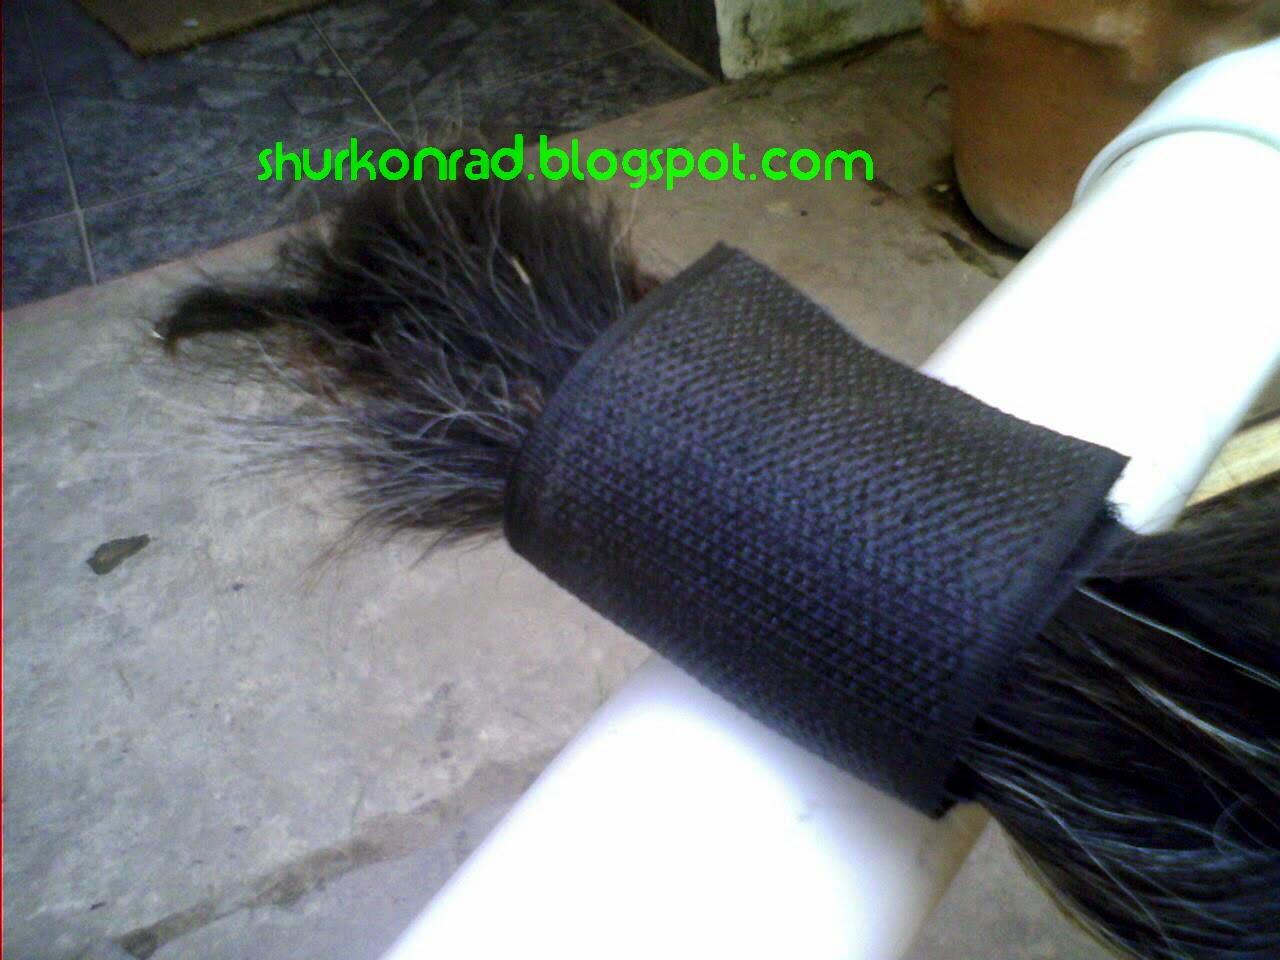 ShurKonrad perro silla ruedas dog 26